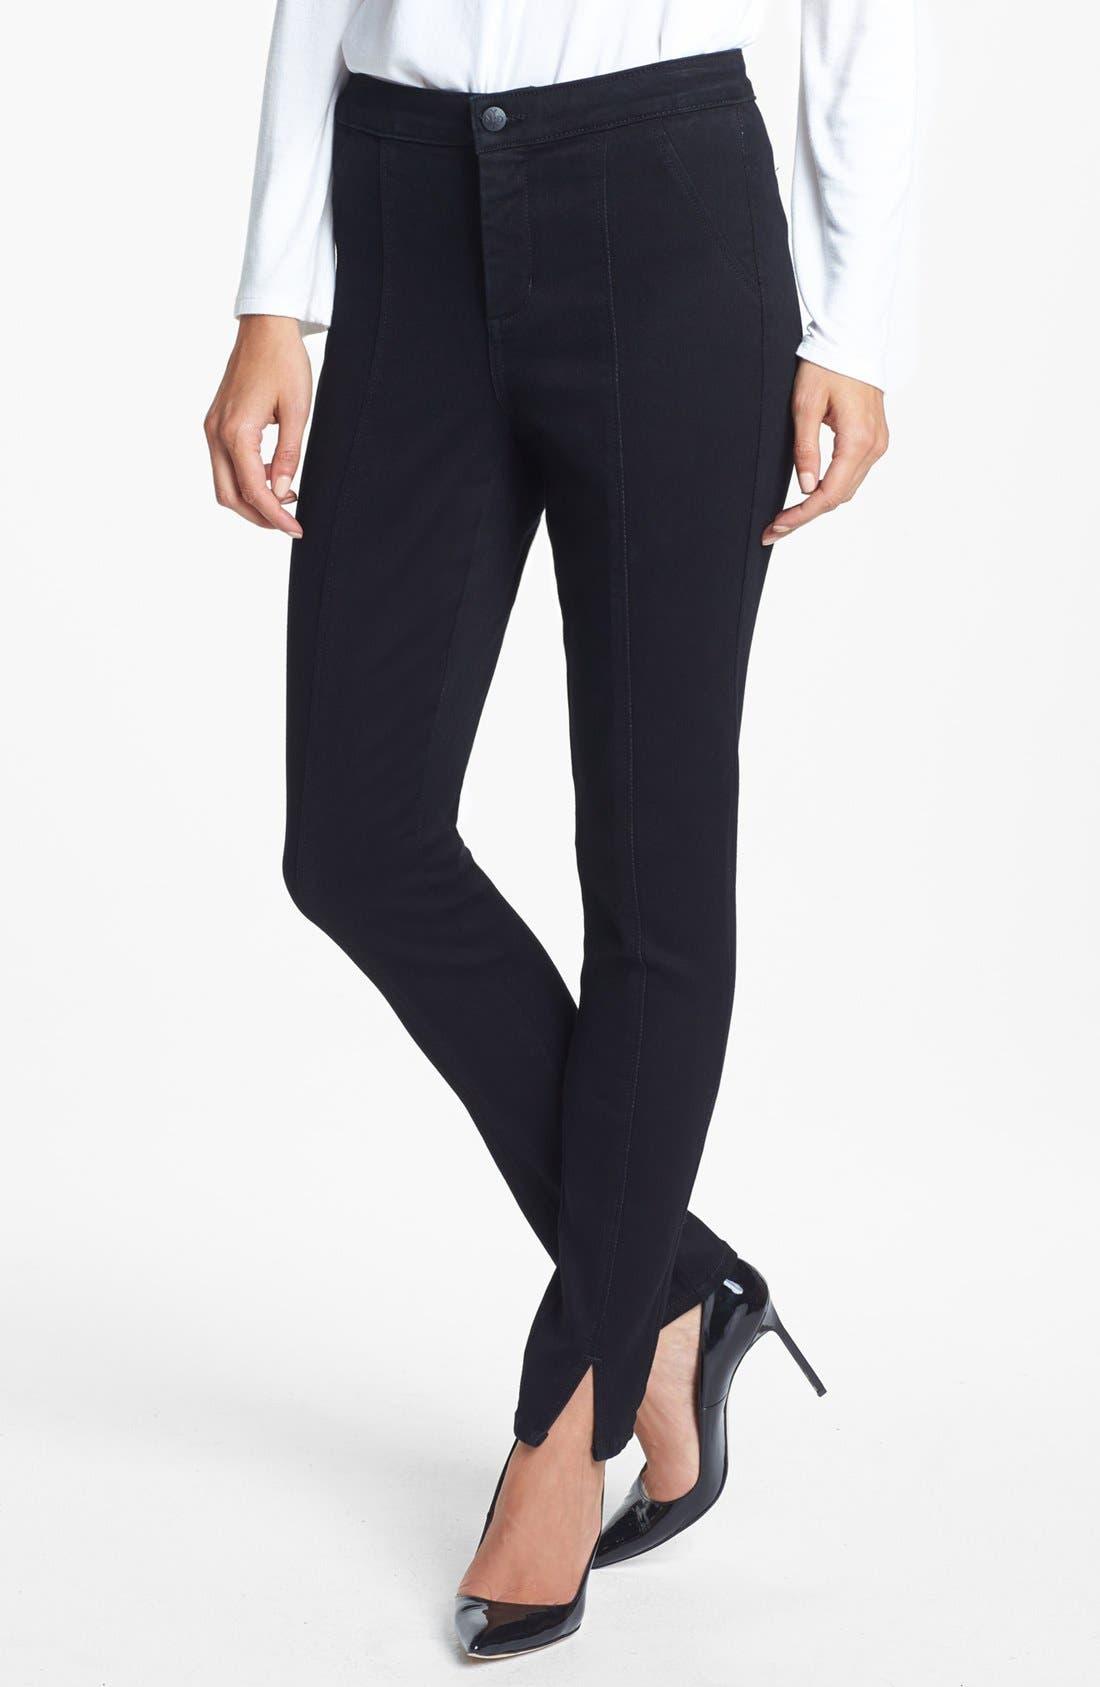 Main Image - NYDJ 'Lotus' Stretch Skinny Jeans (Overdye Black)